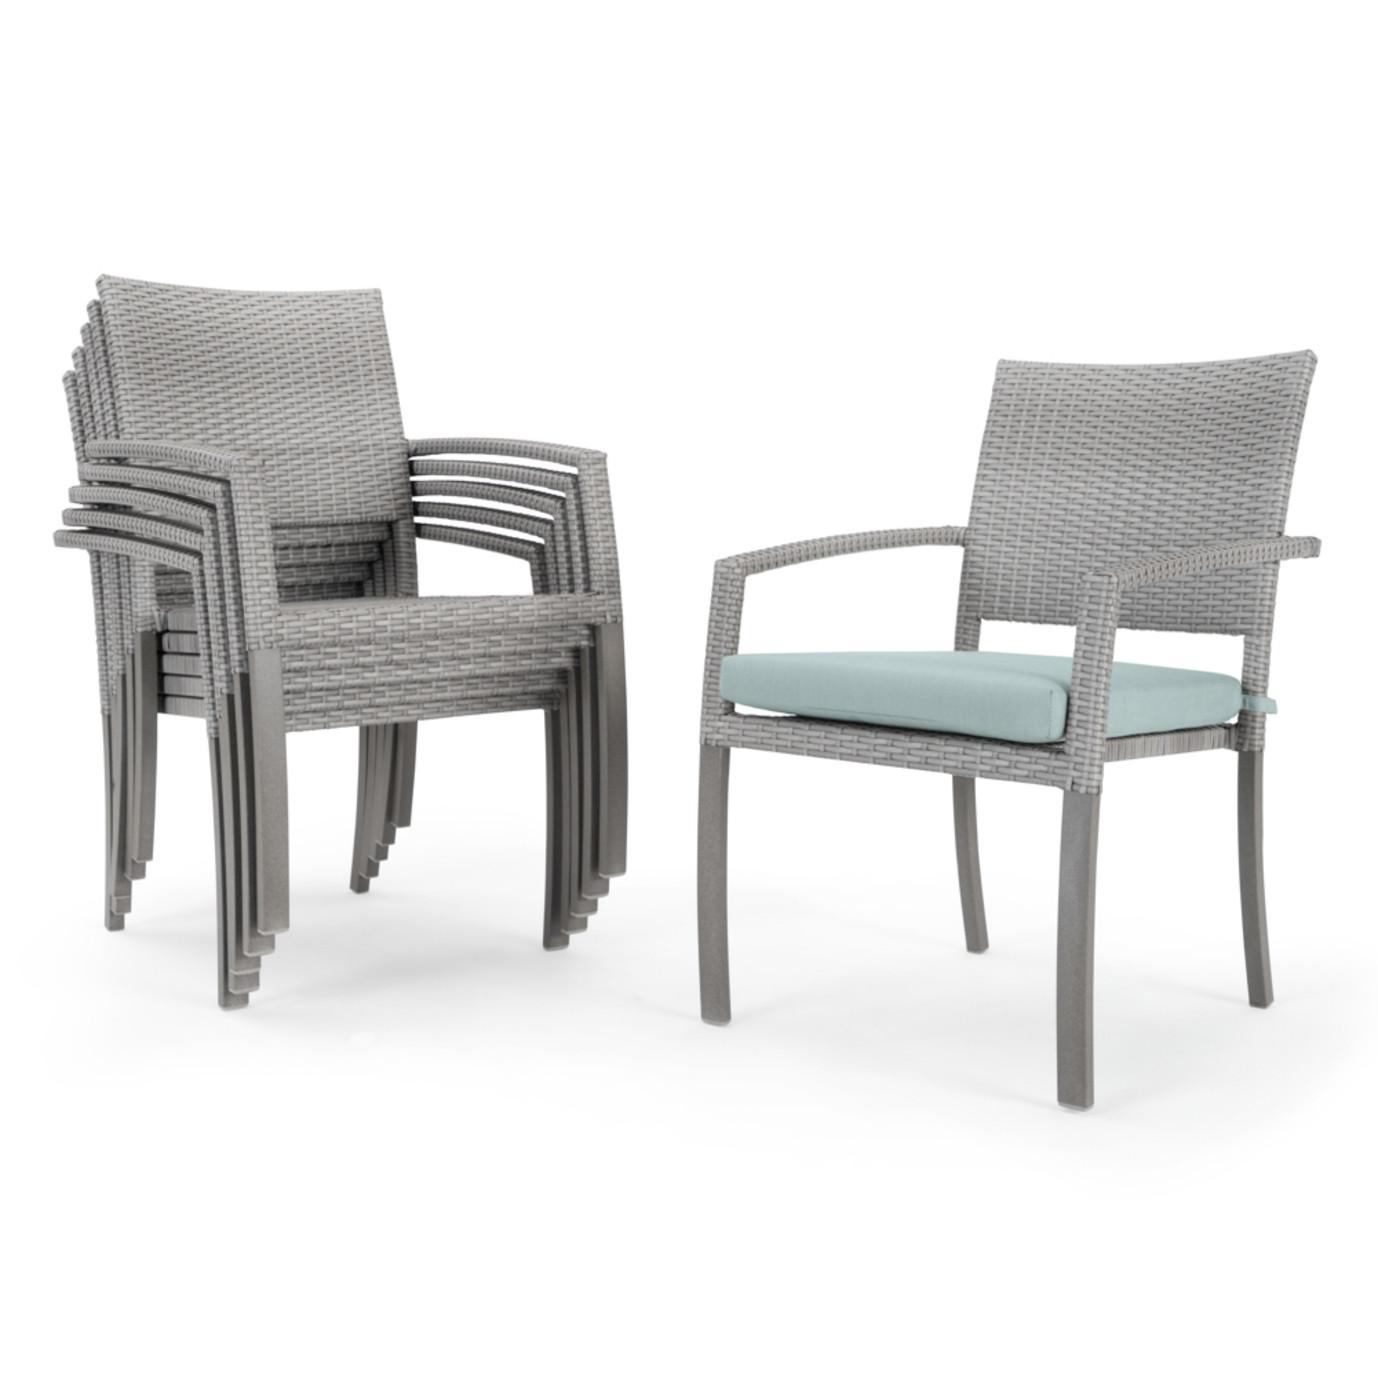 Portofino® Casual 6 Piece Dining Chairs